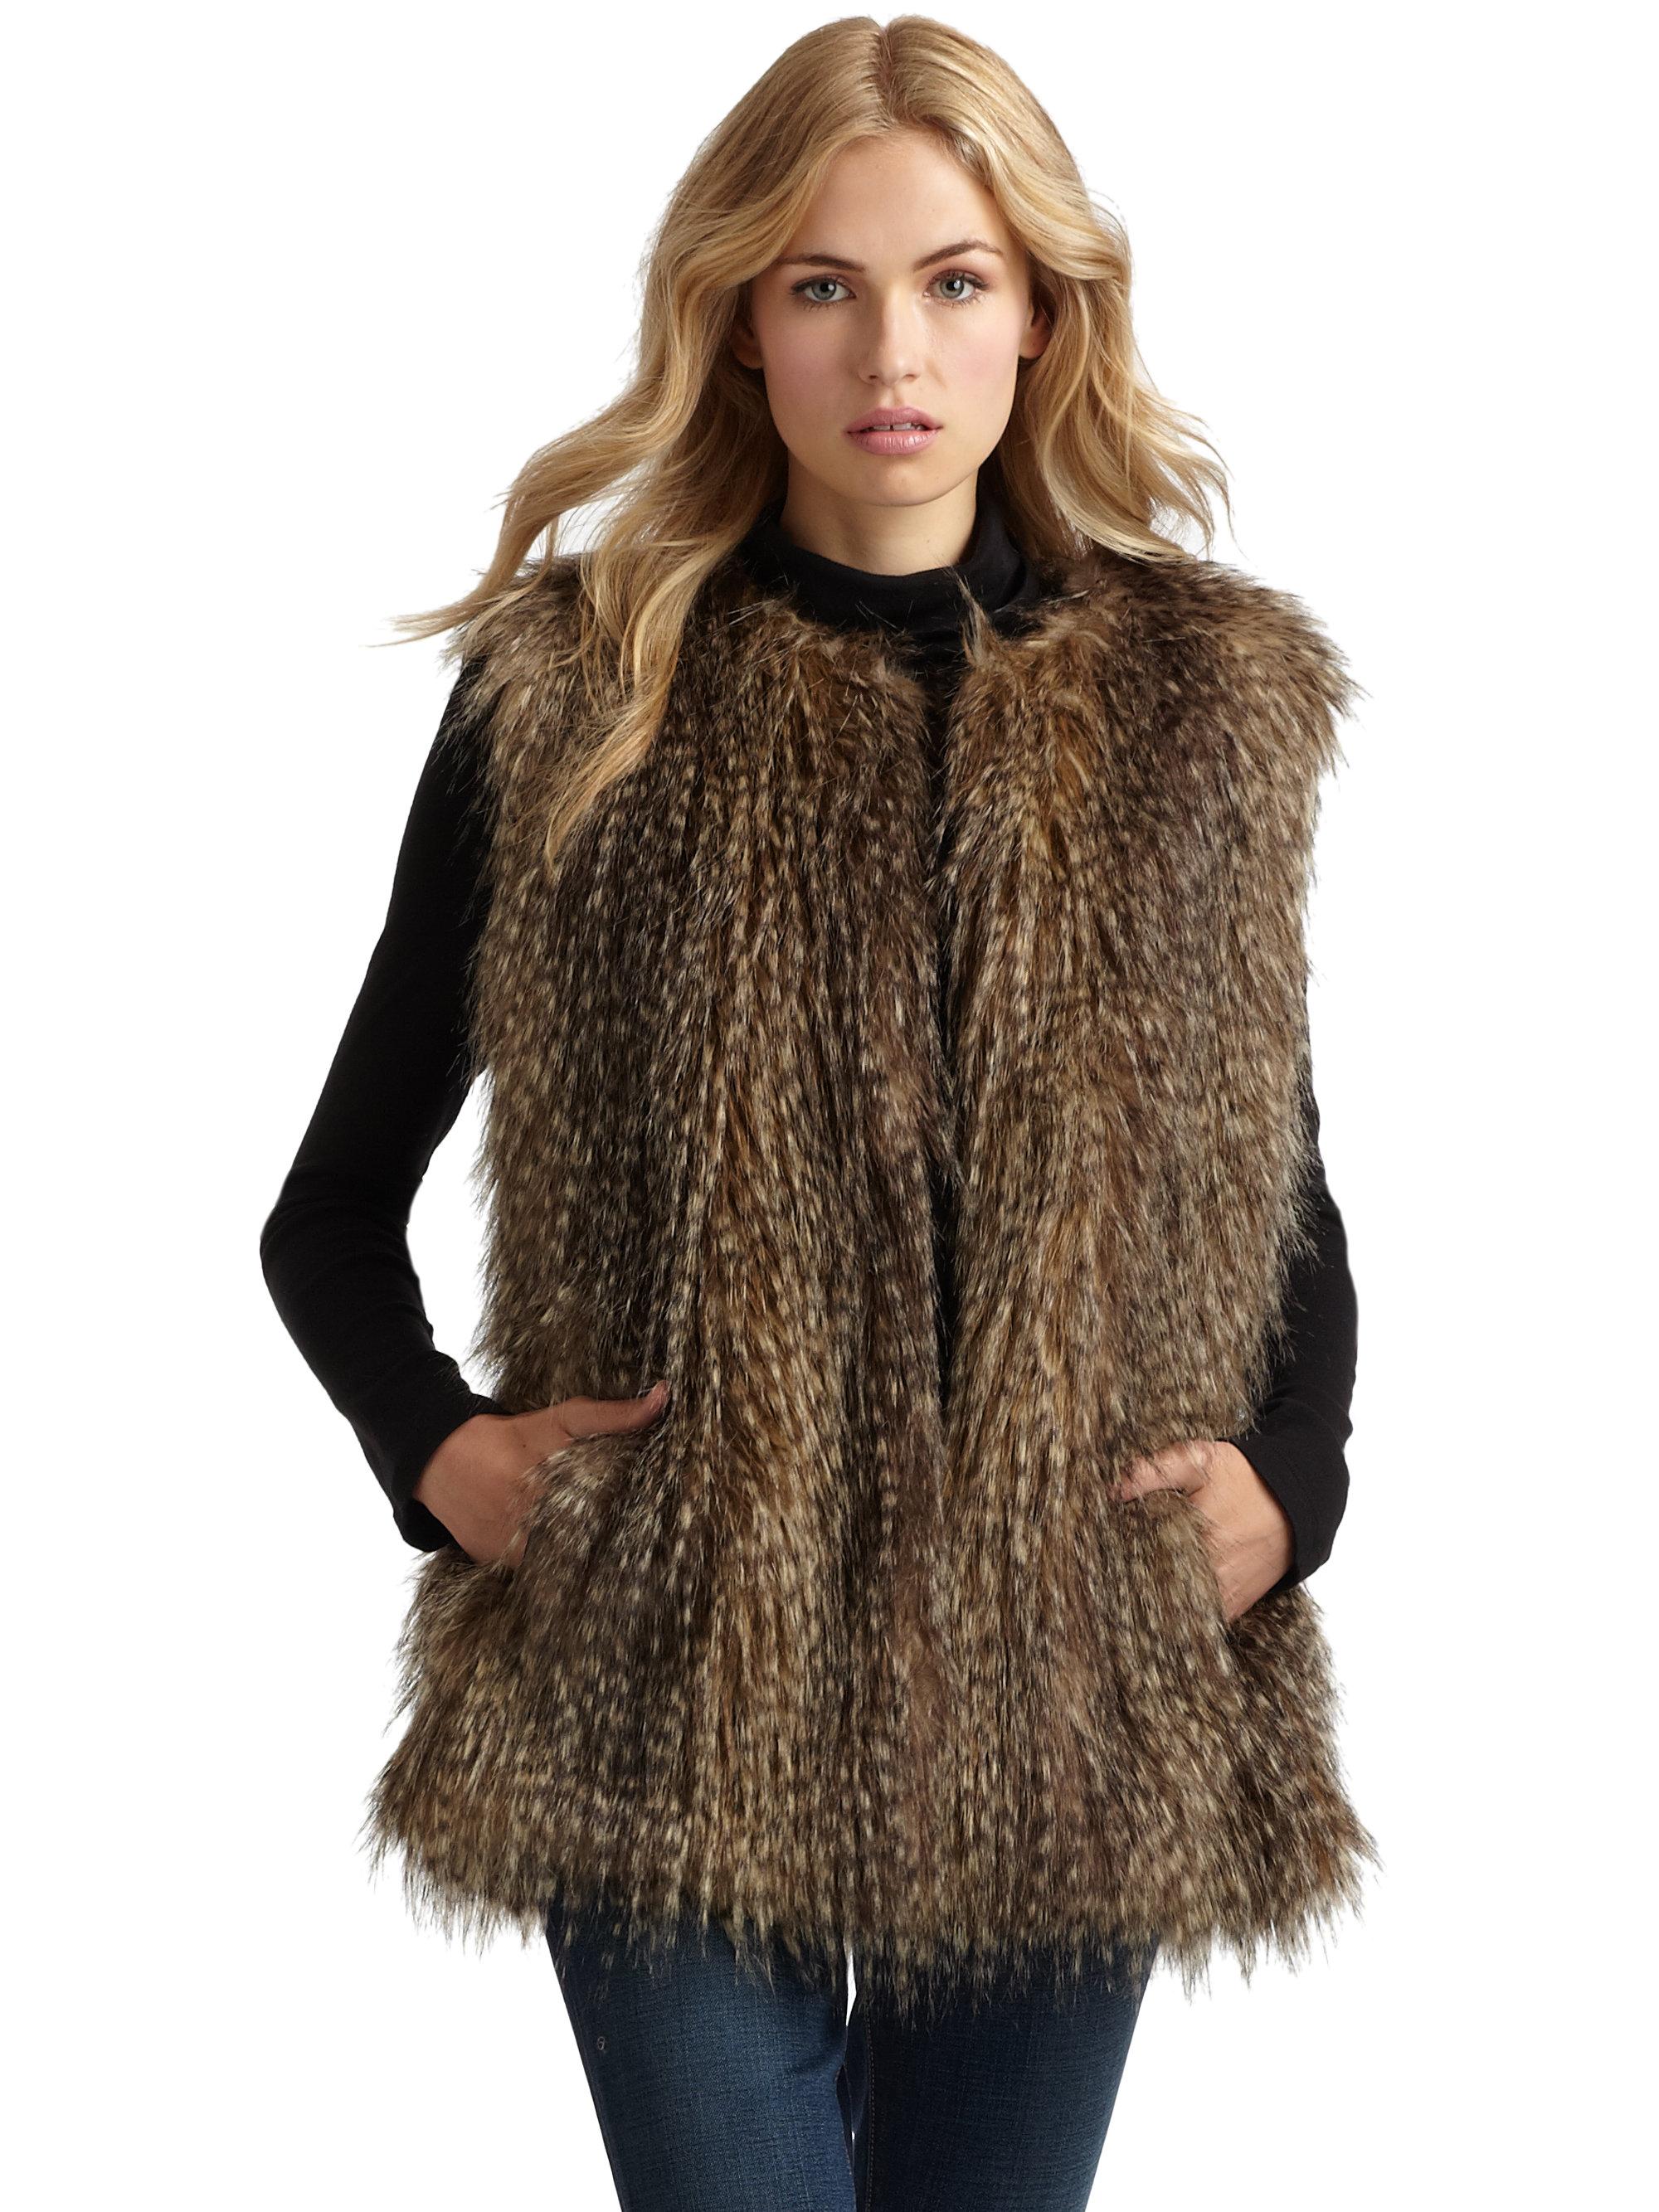 Womens Via Spiga Faux Fur Vest, Size Medium - Brown